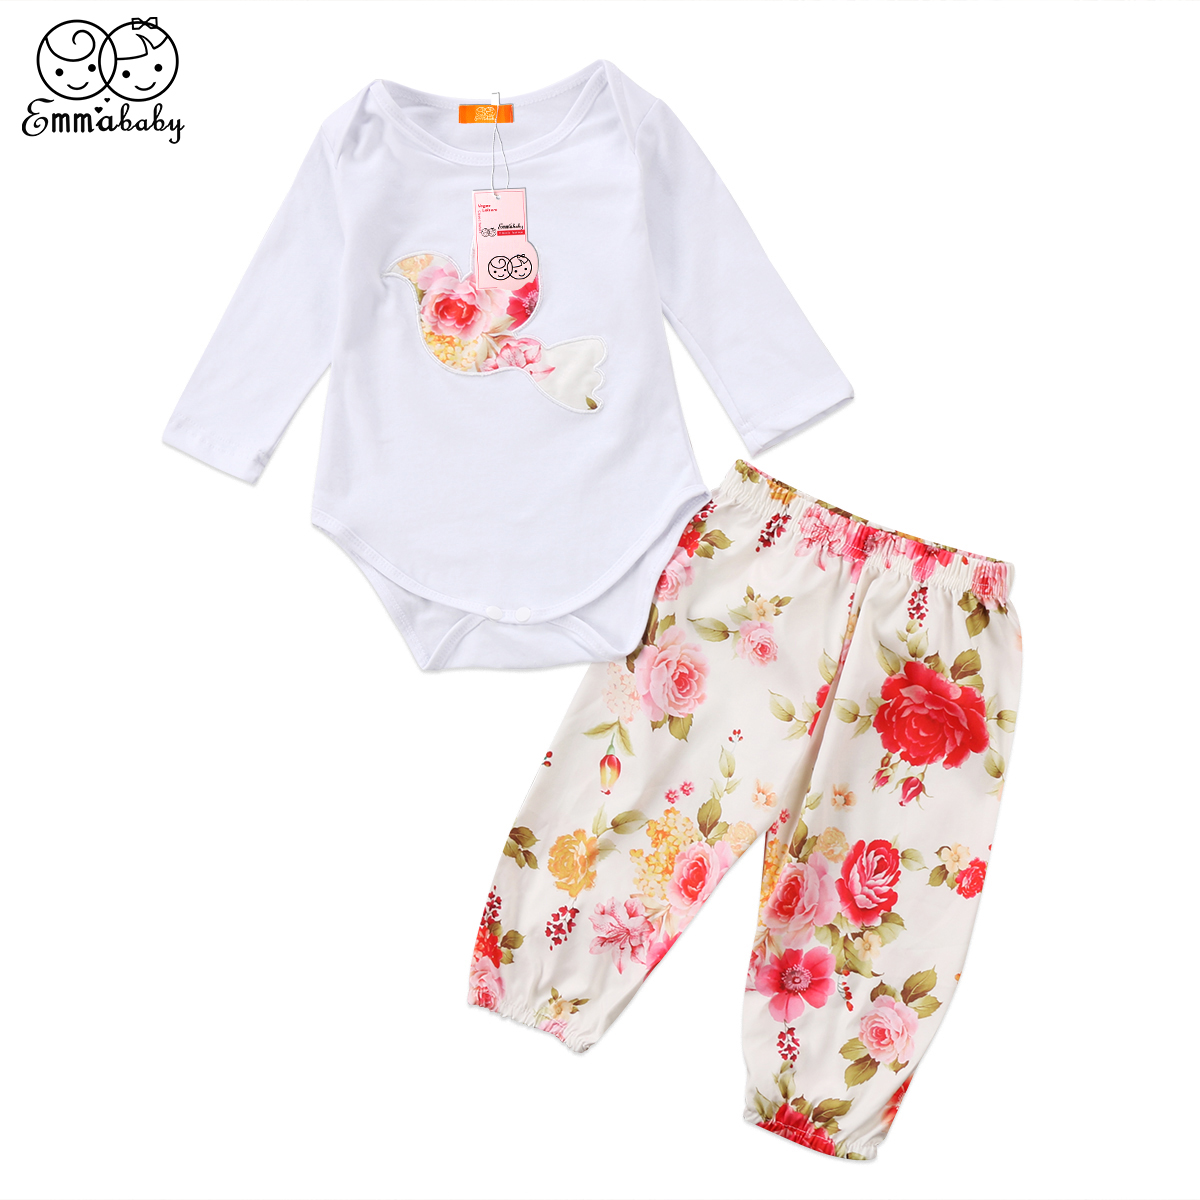 2018 New Fashion Newborn Toddler Girls Bird Floral Print Cotton Bodysuit Floral Pants 2pcs Cute Baby Girl Clothes Outfits Set